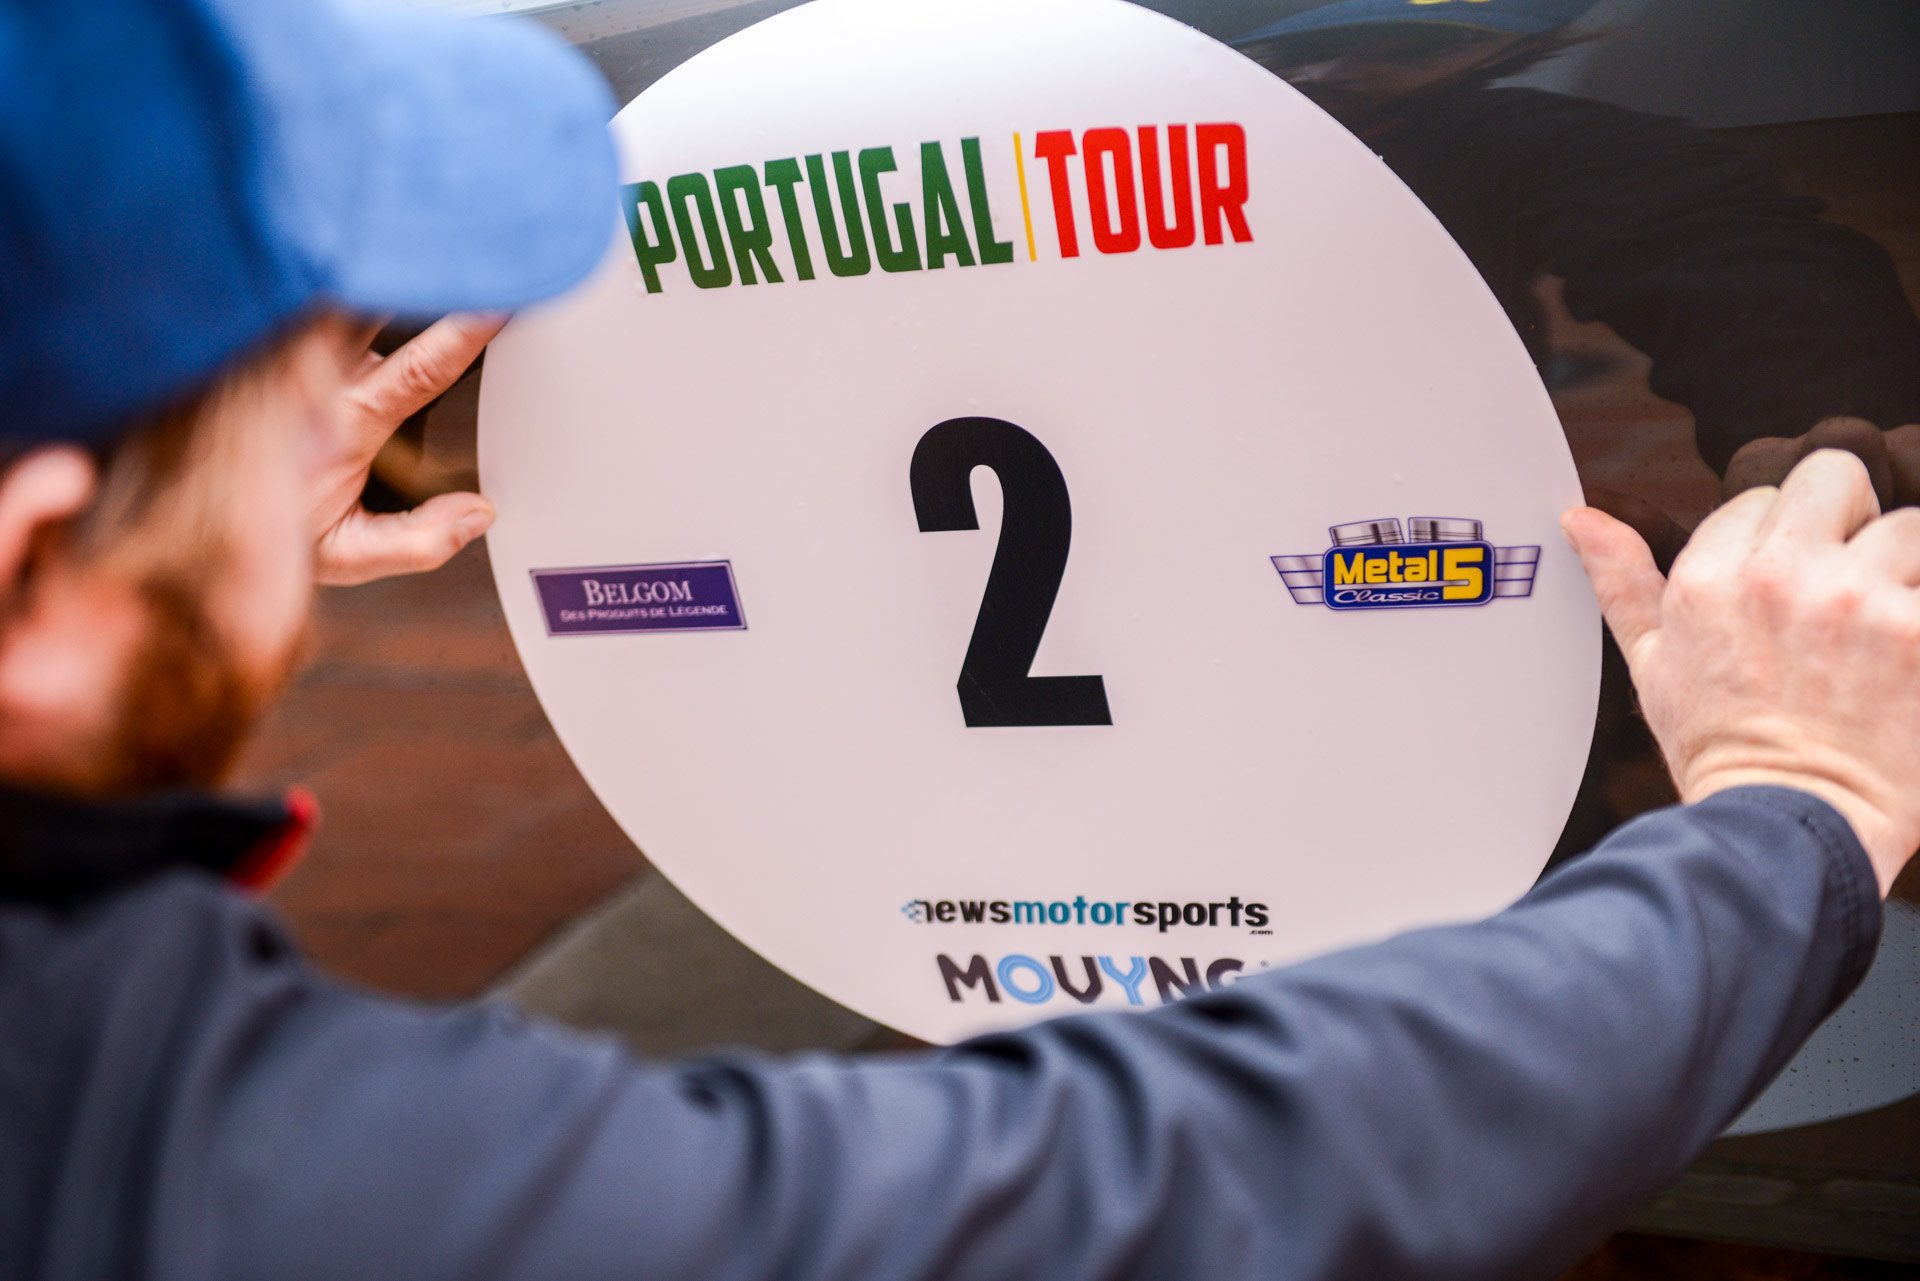 Portugal Tour